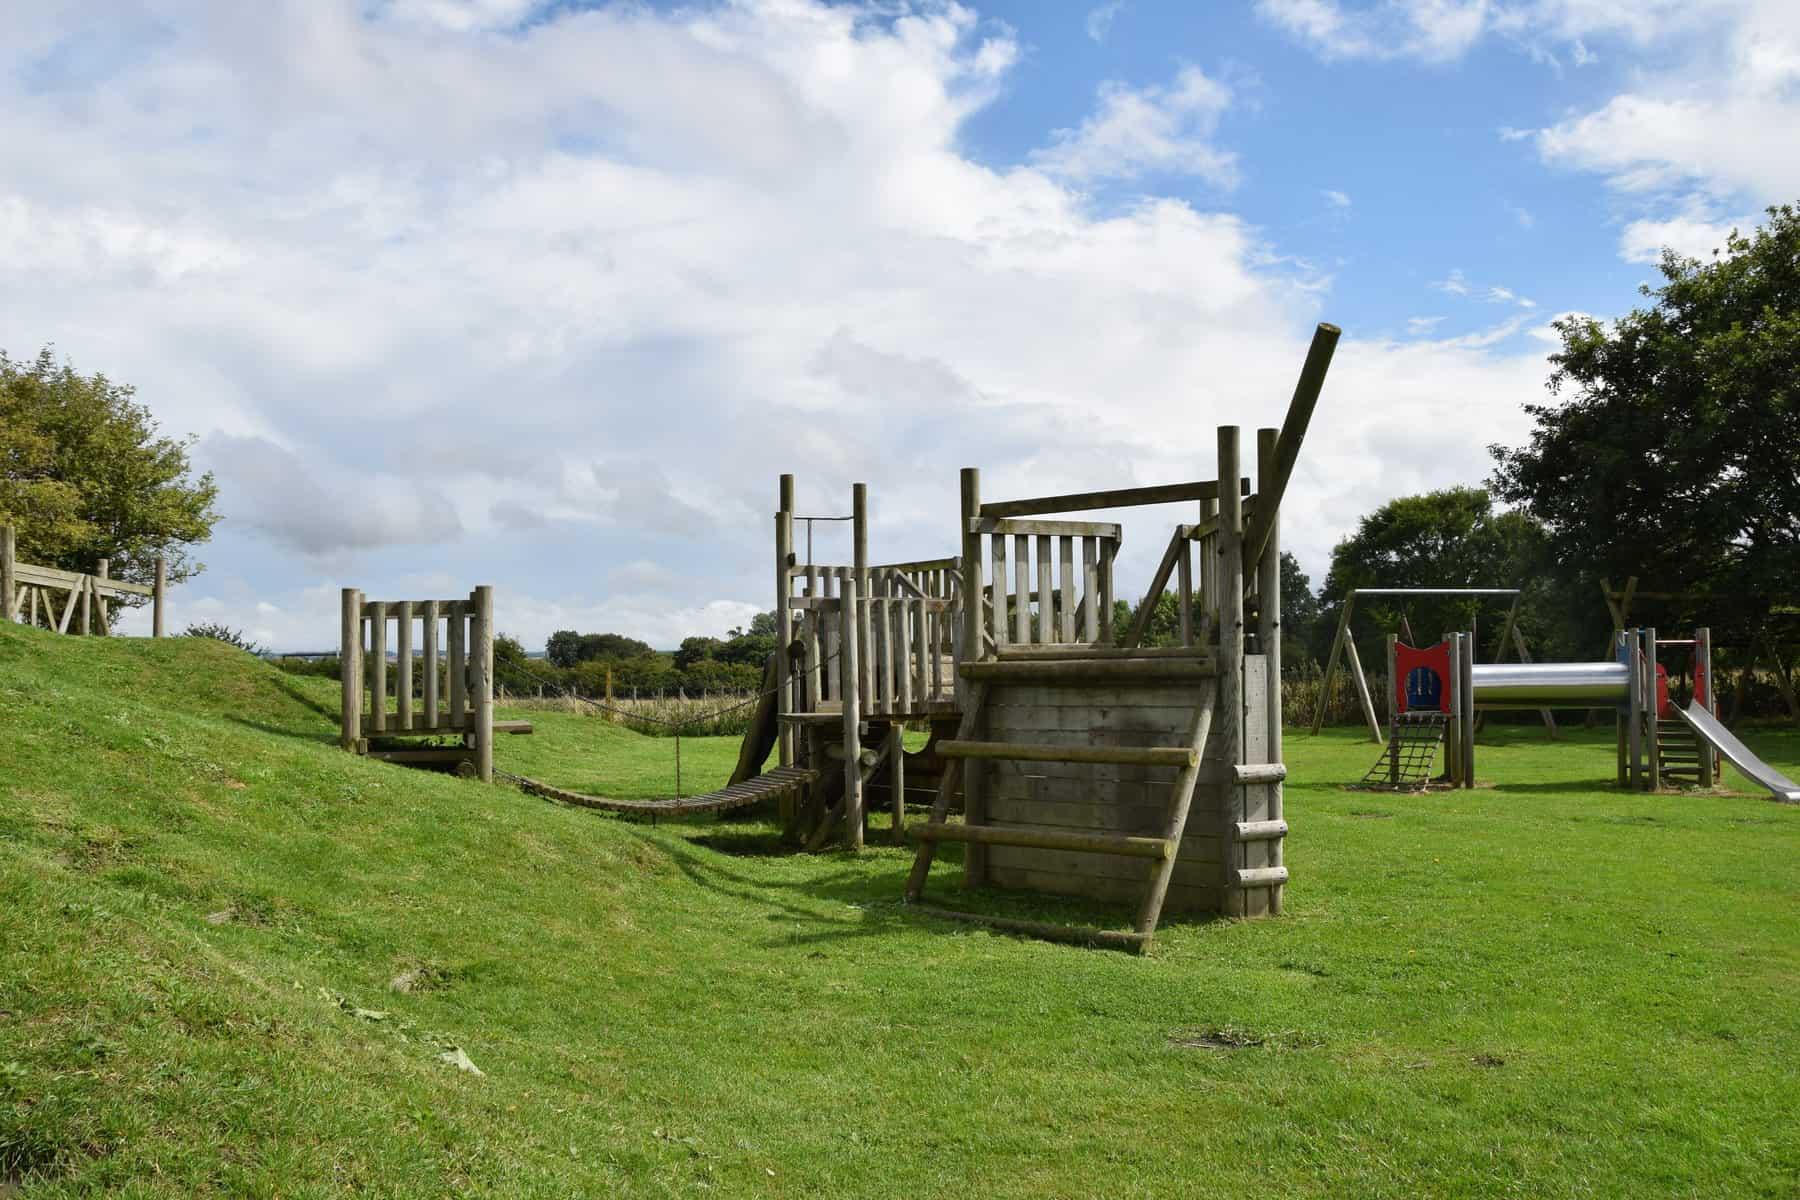 South Moreton Recreation Ground